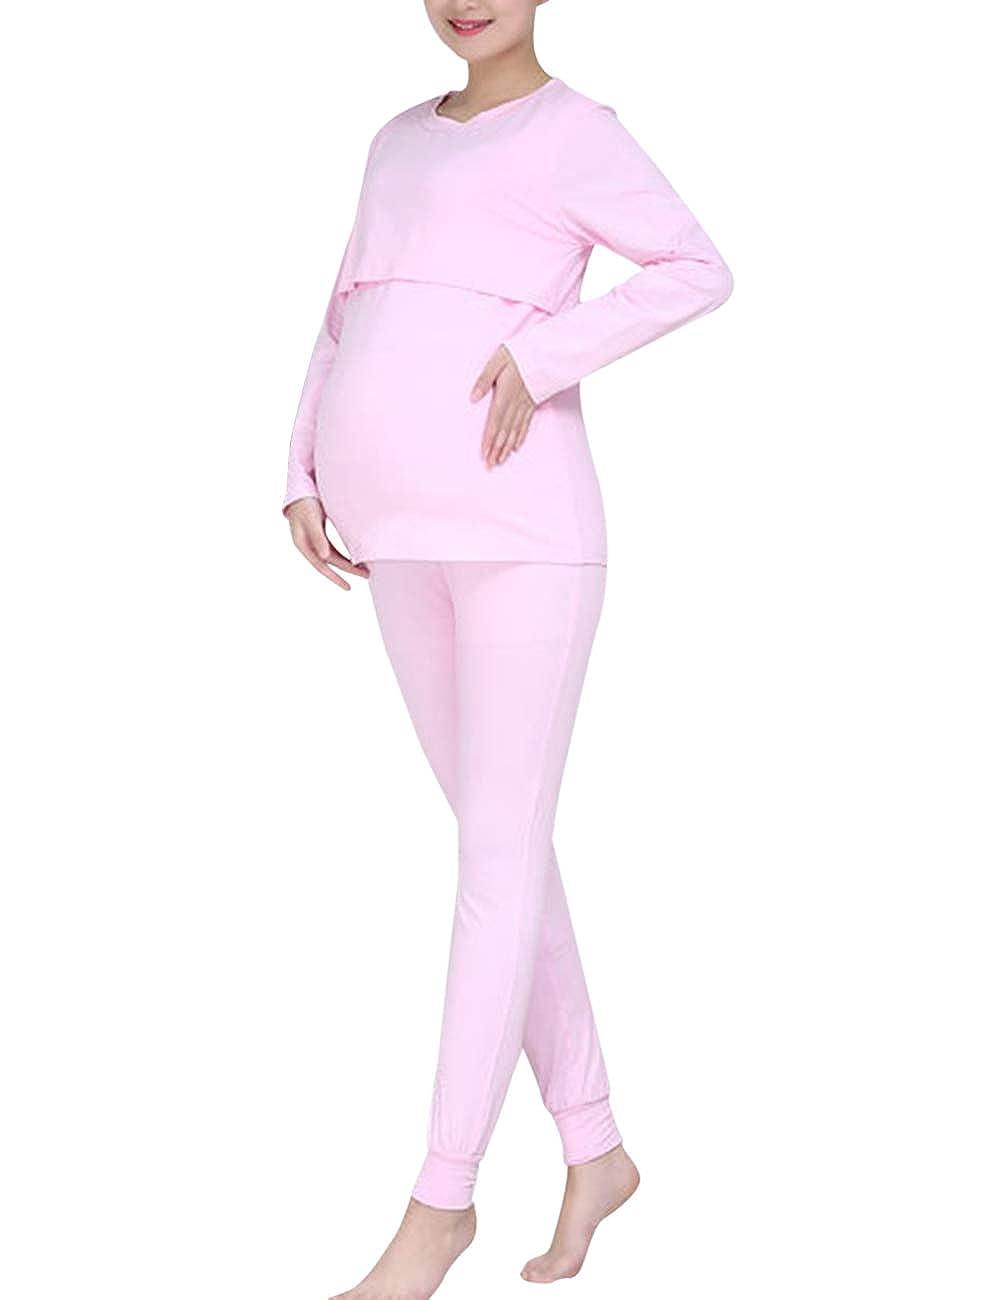 Zhhlinyuan Pregnancy Nursing Breastfeeding Tops Long Pants Sets - Maternity Sleepwear